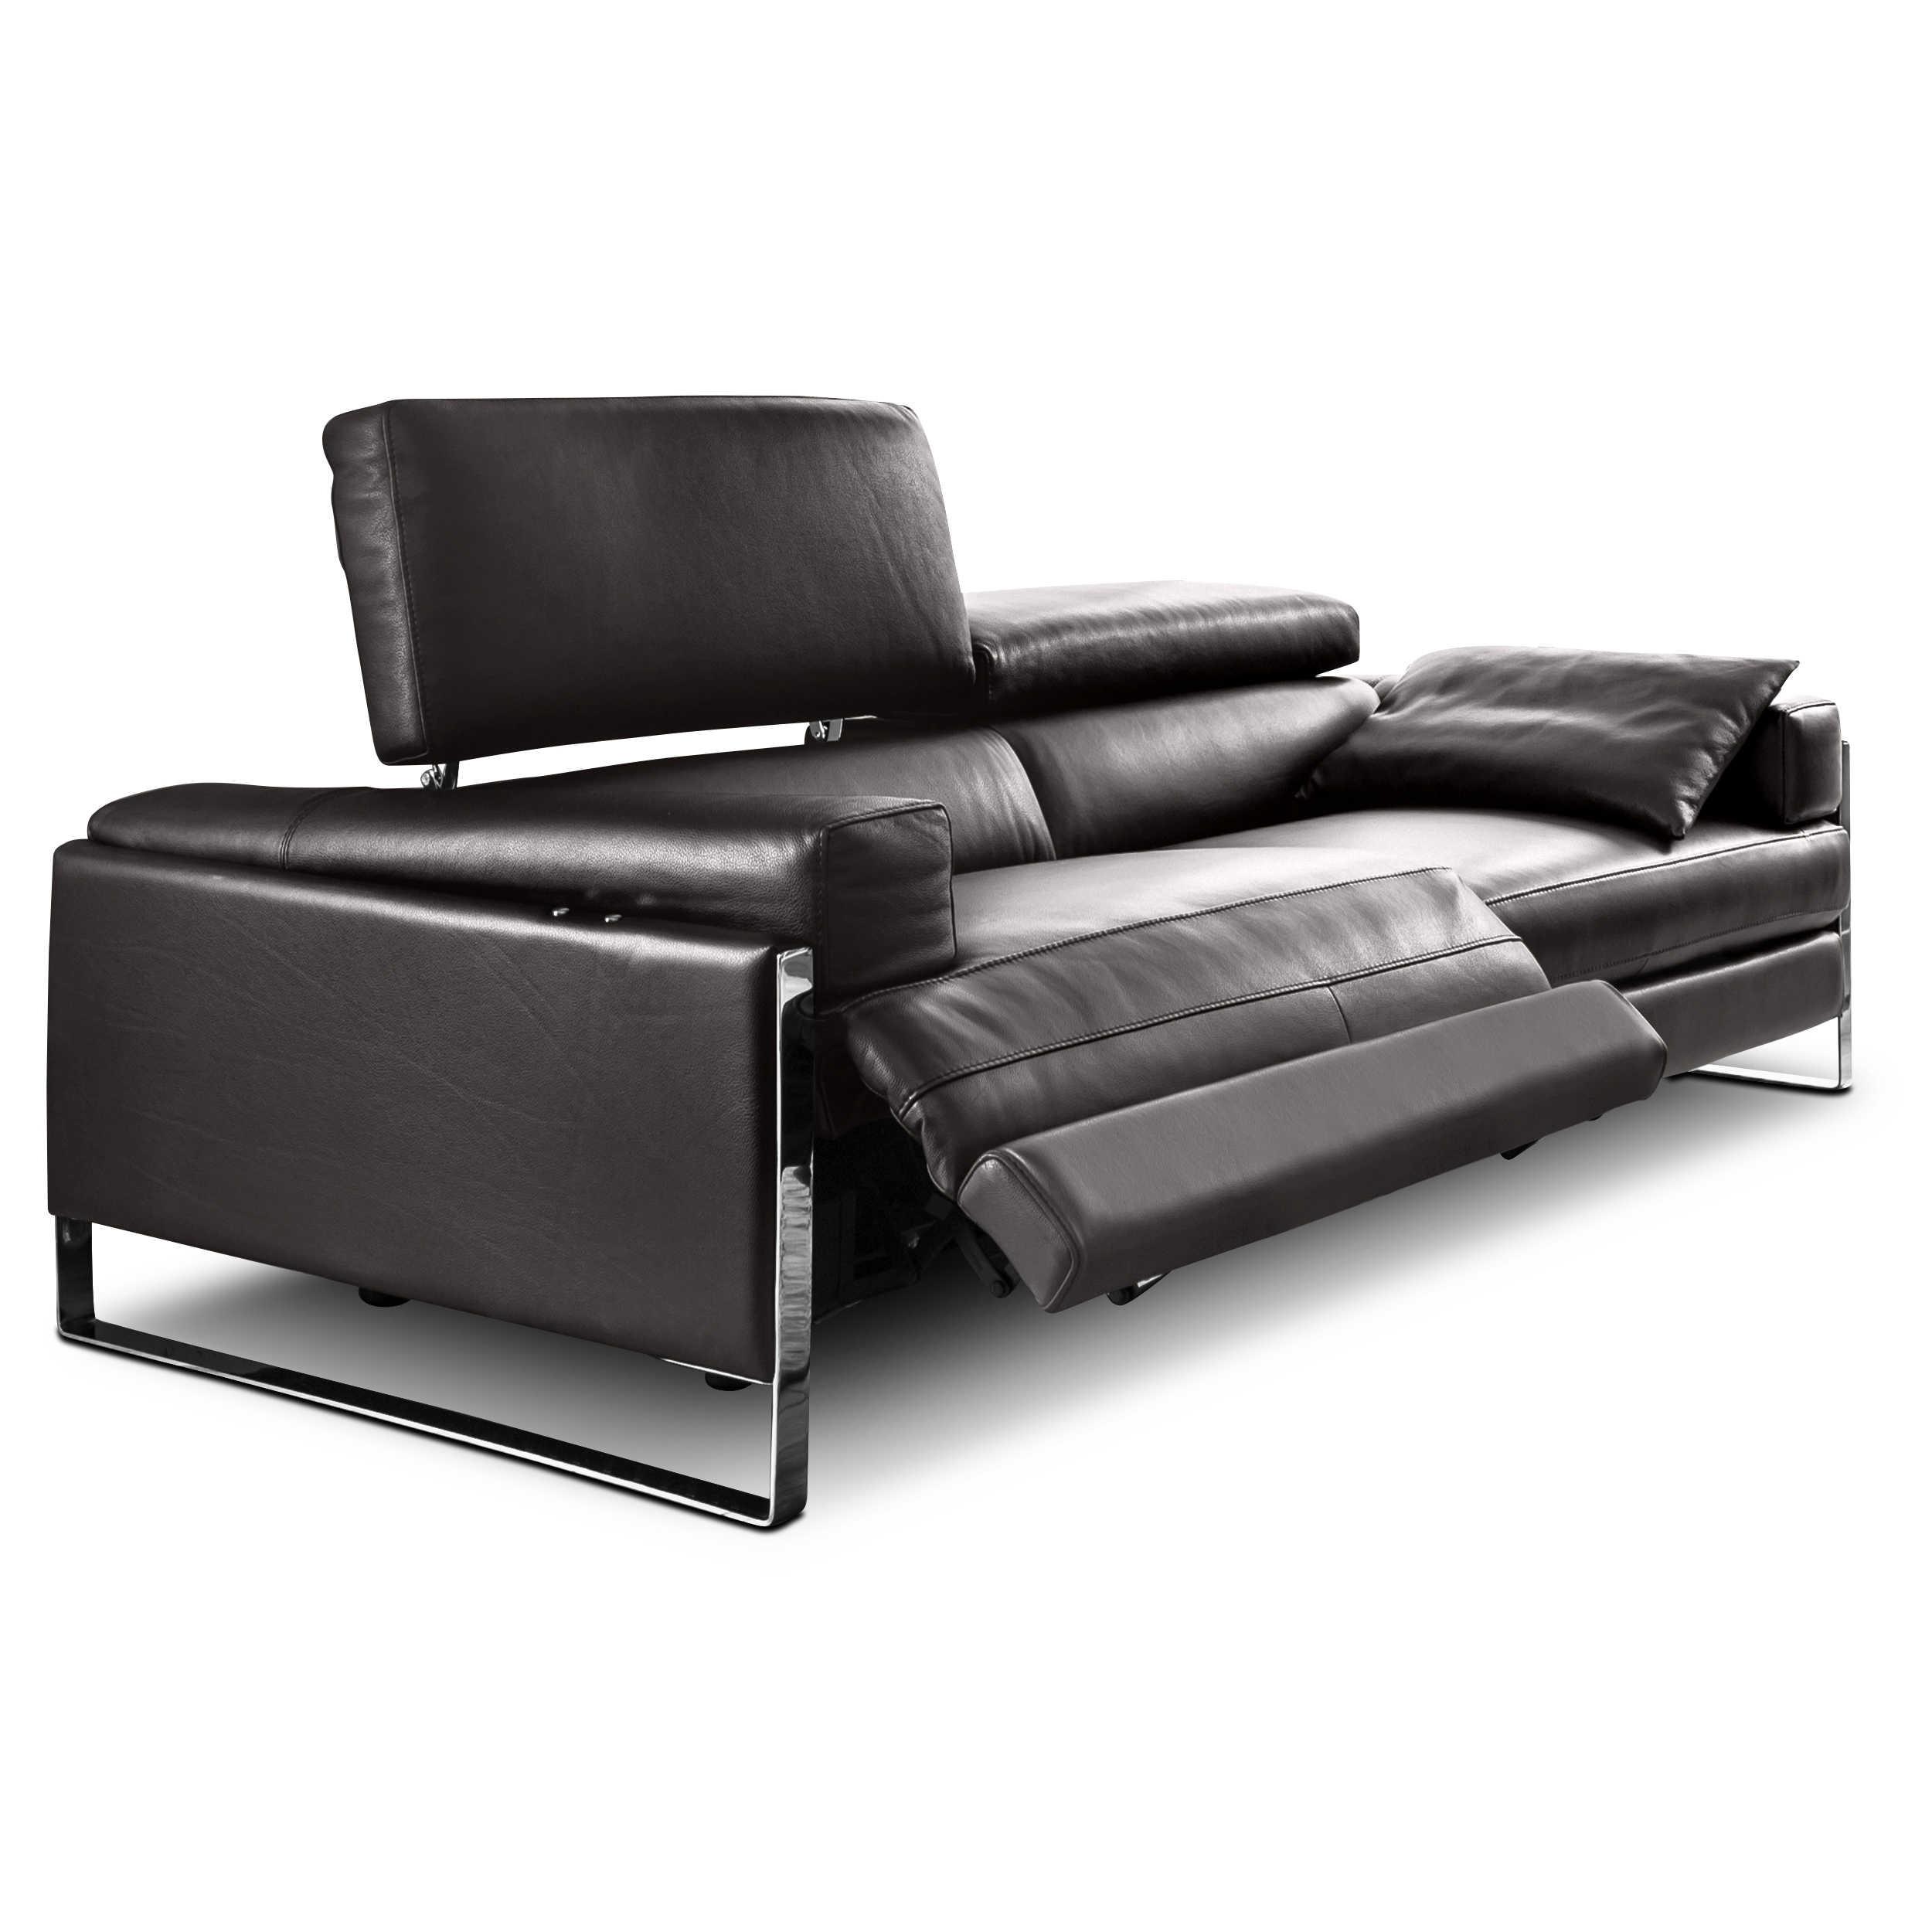 calia sofa romeo relax cal 808 braun leder online kaufen bei woonio. Black Bedroom Furniture Sets. Home Design Ideas